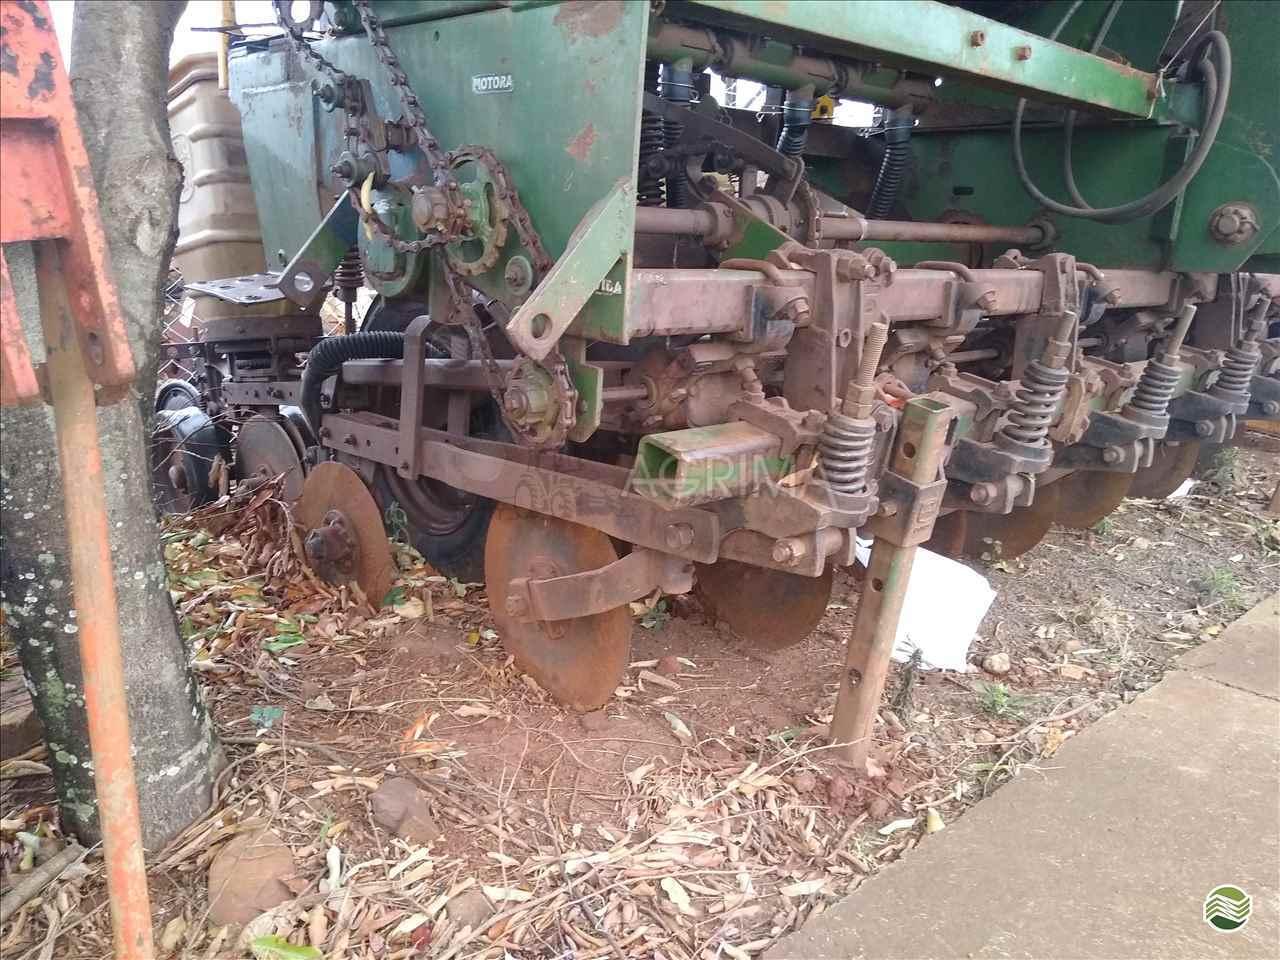 IMPLEMENTOS AGRICOLAS CARRETA AGRÍCOLA CARRETA BASCULANTE Agrima Implementos Agrícolas MARINGA PARANÁ PR